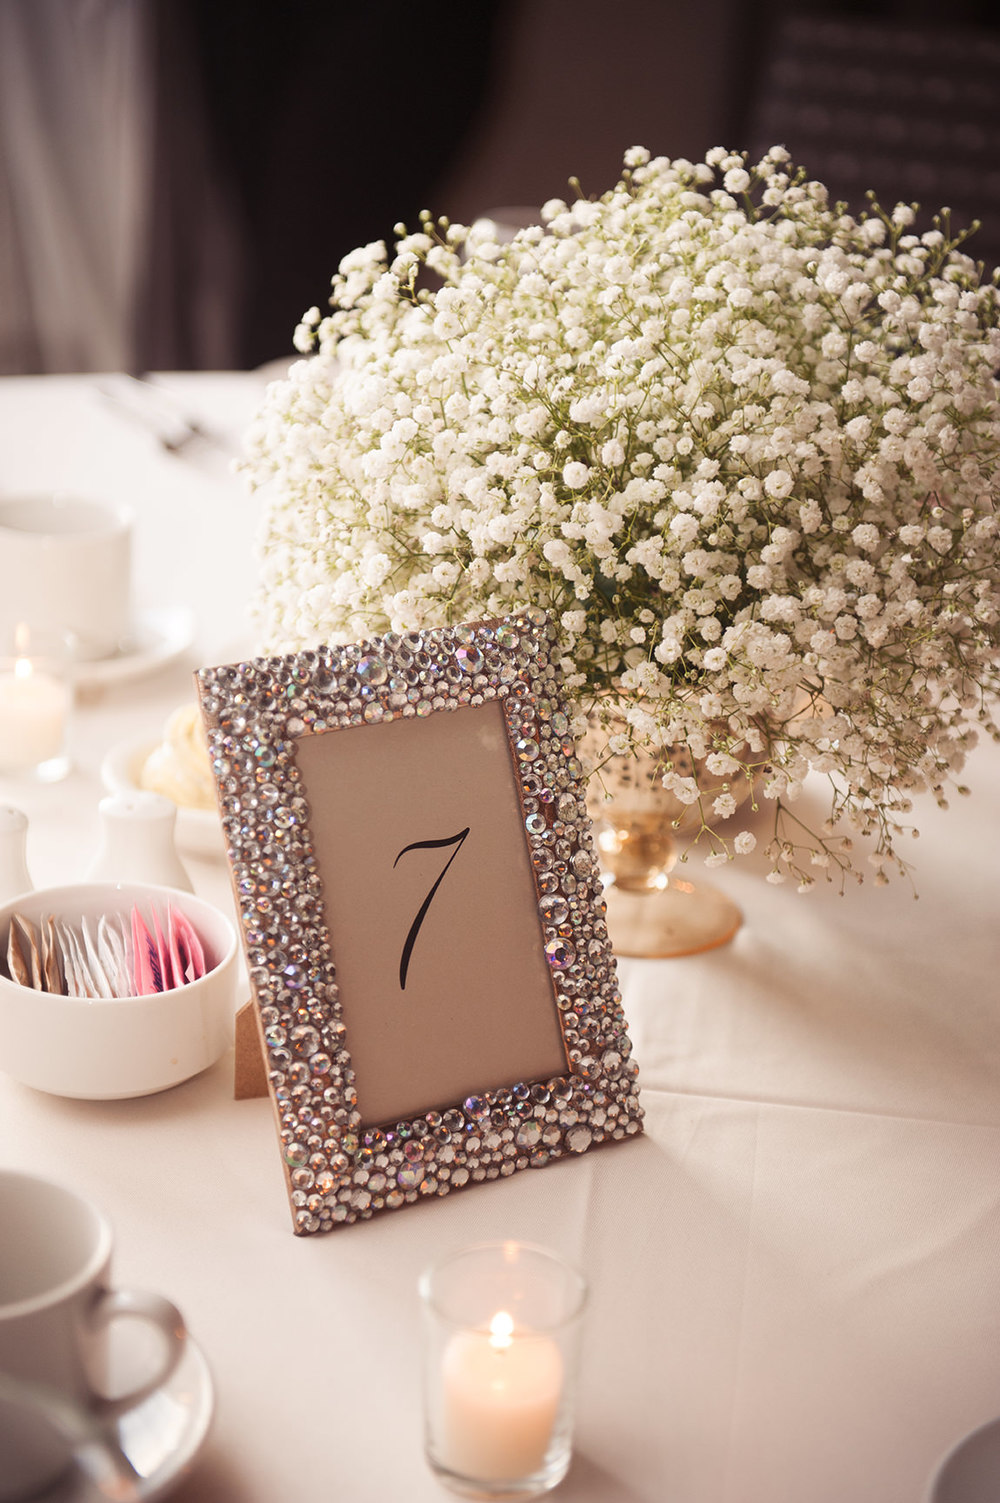 St-Catharines-Wedding-Stone-Mill-Inn-Amy-Darryl-photography-by-Morgan-Falk-061.JPG